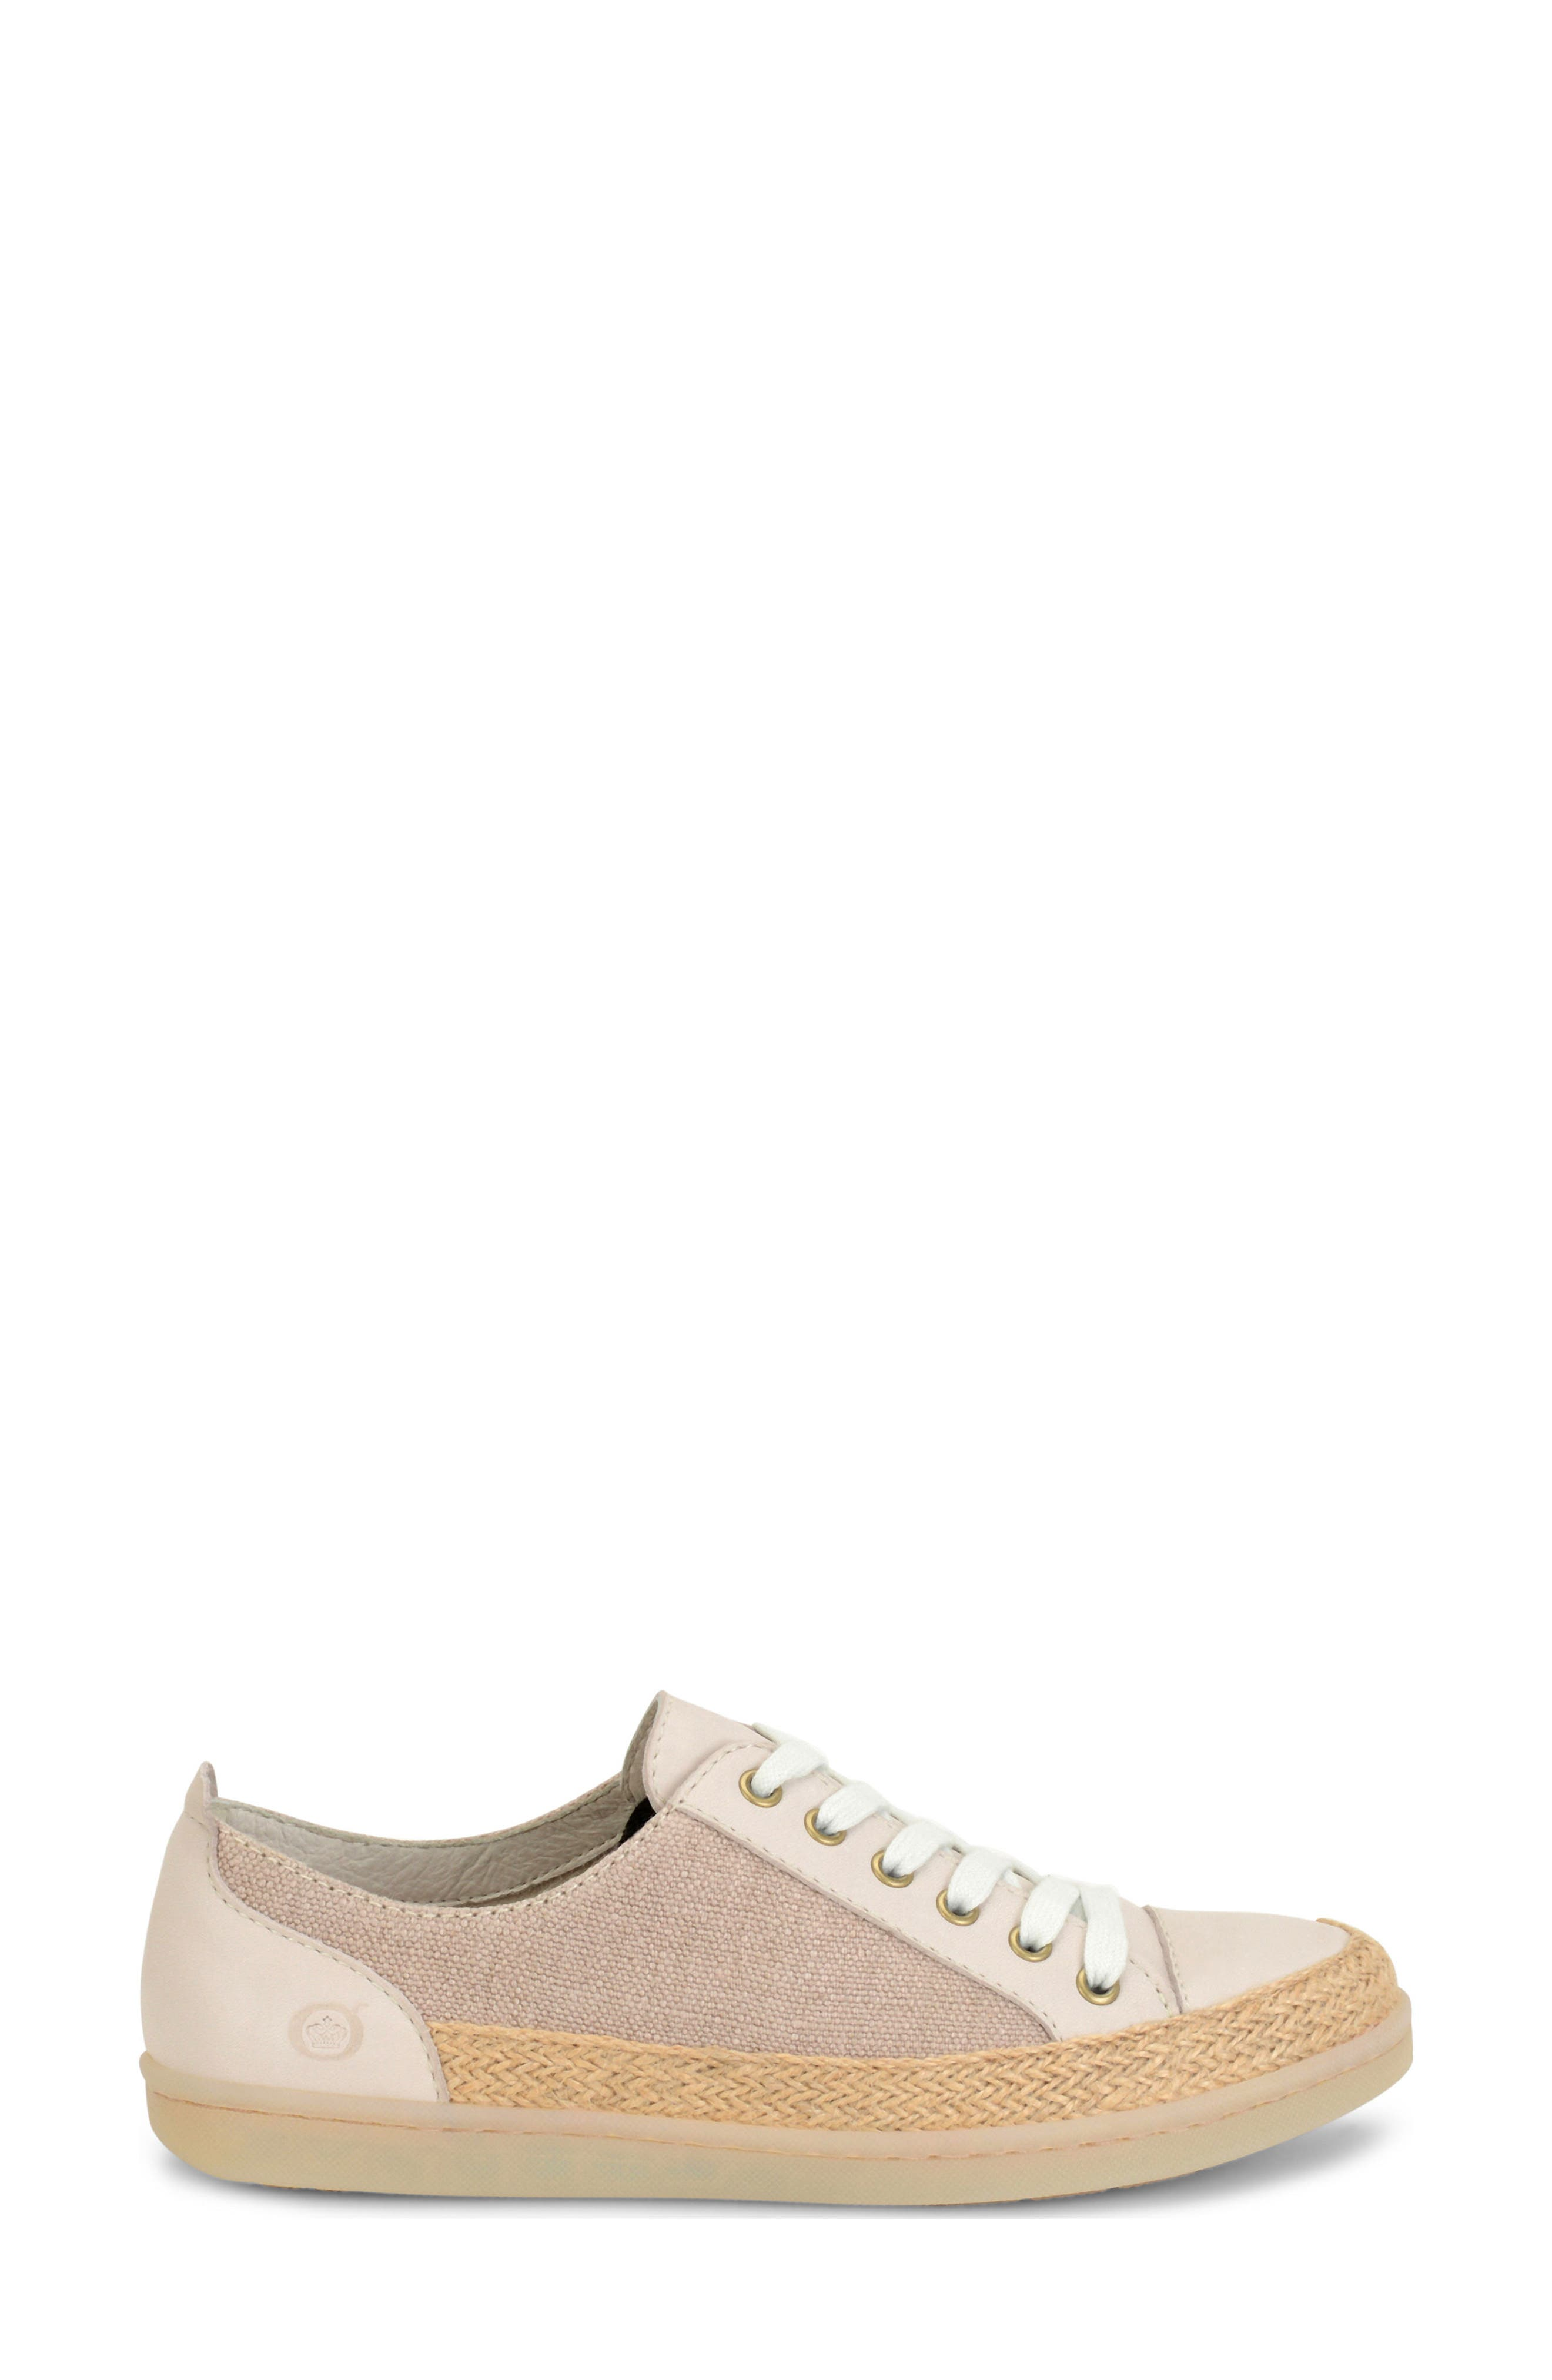 Corfield Sneaker,                             Alternate thumbnail 3, color,                             261